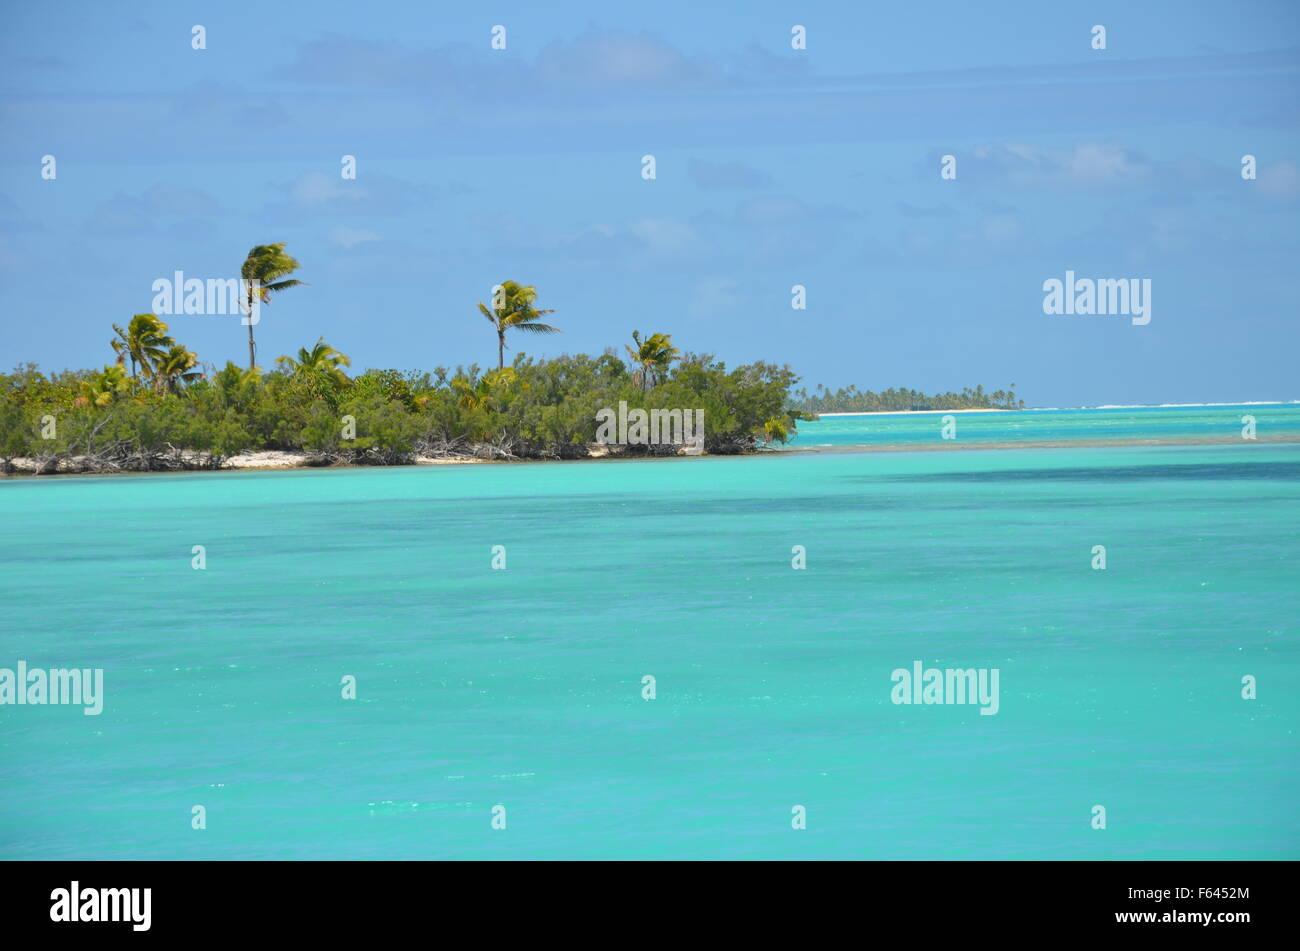 Aitutaki lagoon, the Cook Islands - Stock Image